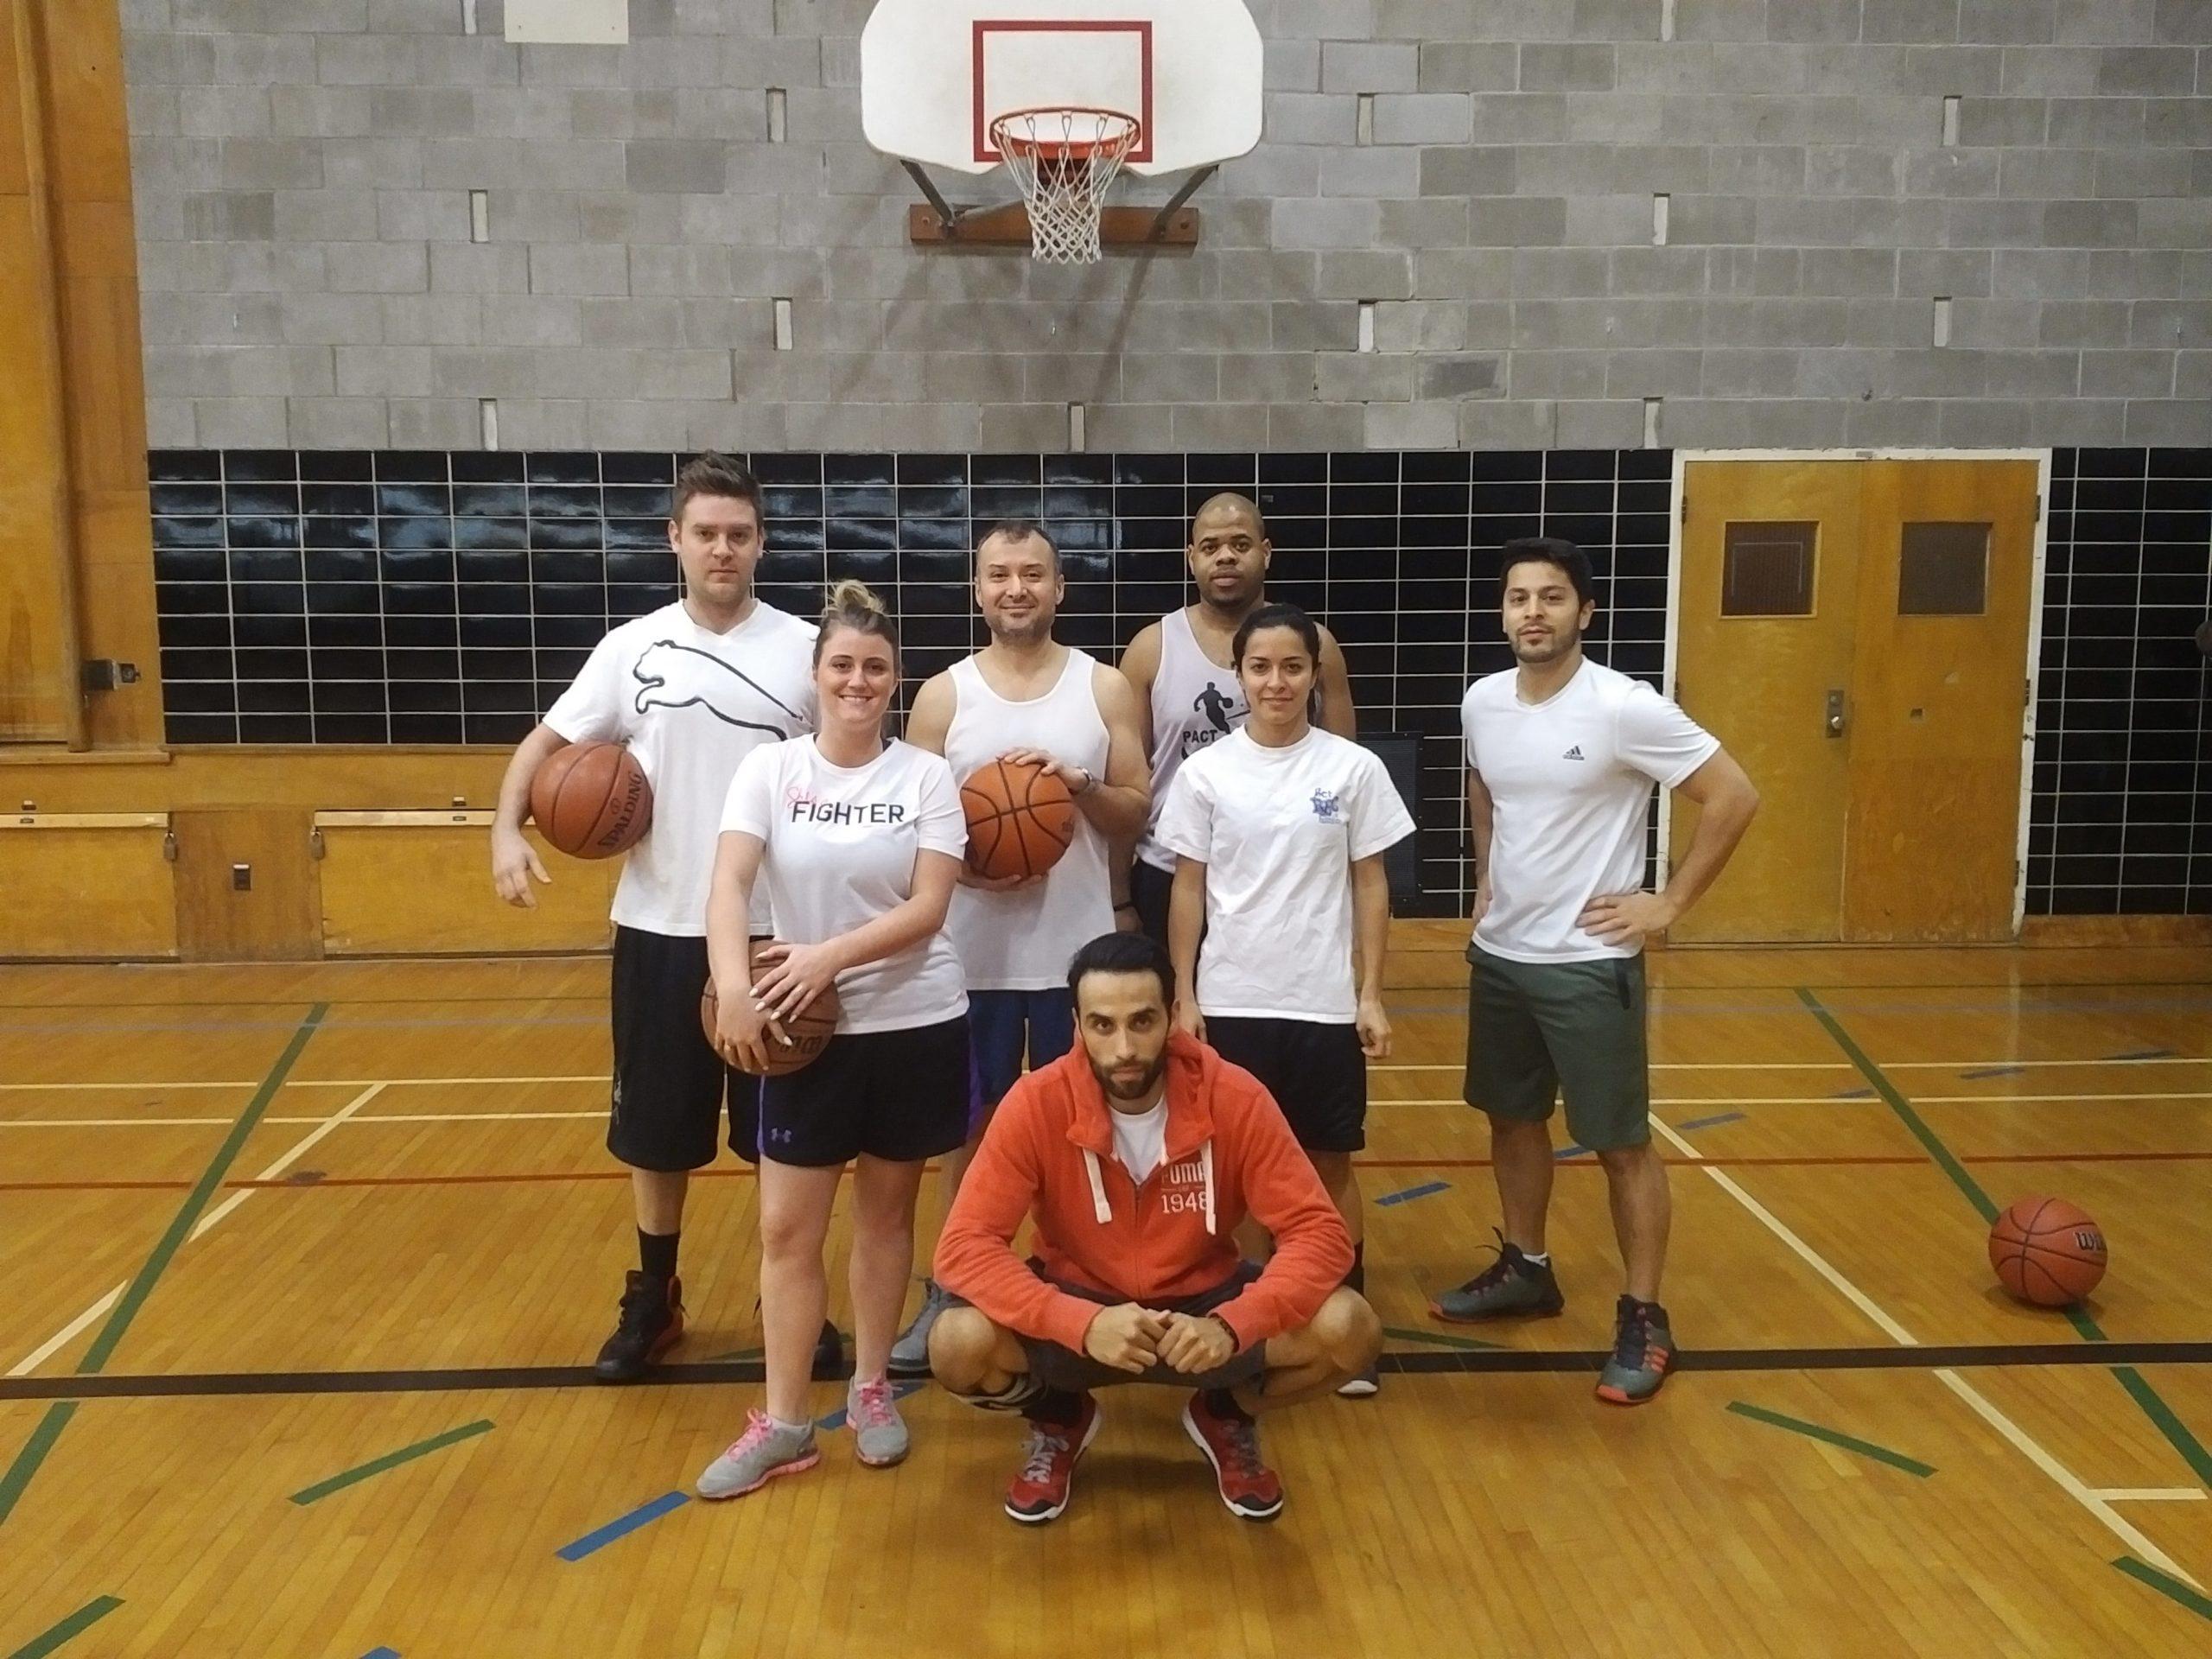 Basketball - Team Monstars-min